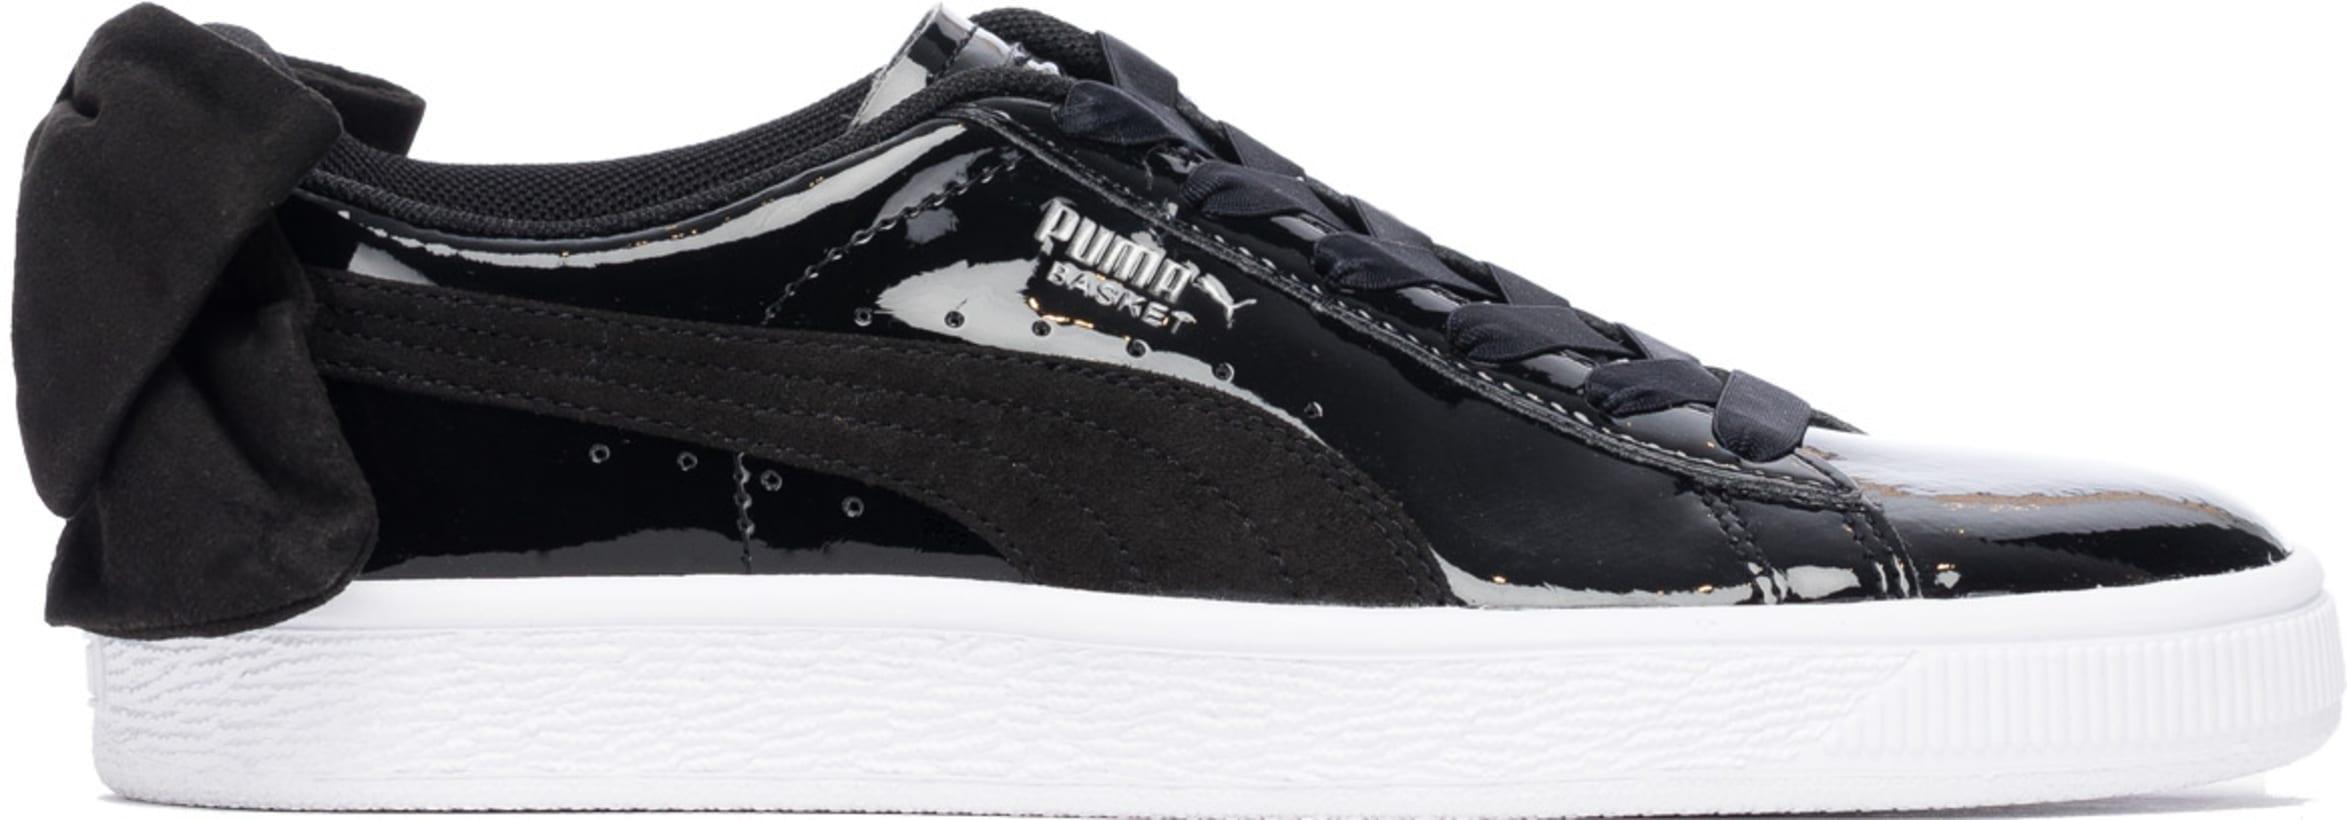 size 40 fe7b1 89c64 Puma - Basket Bow - Black/Black